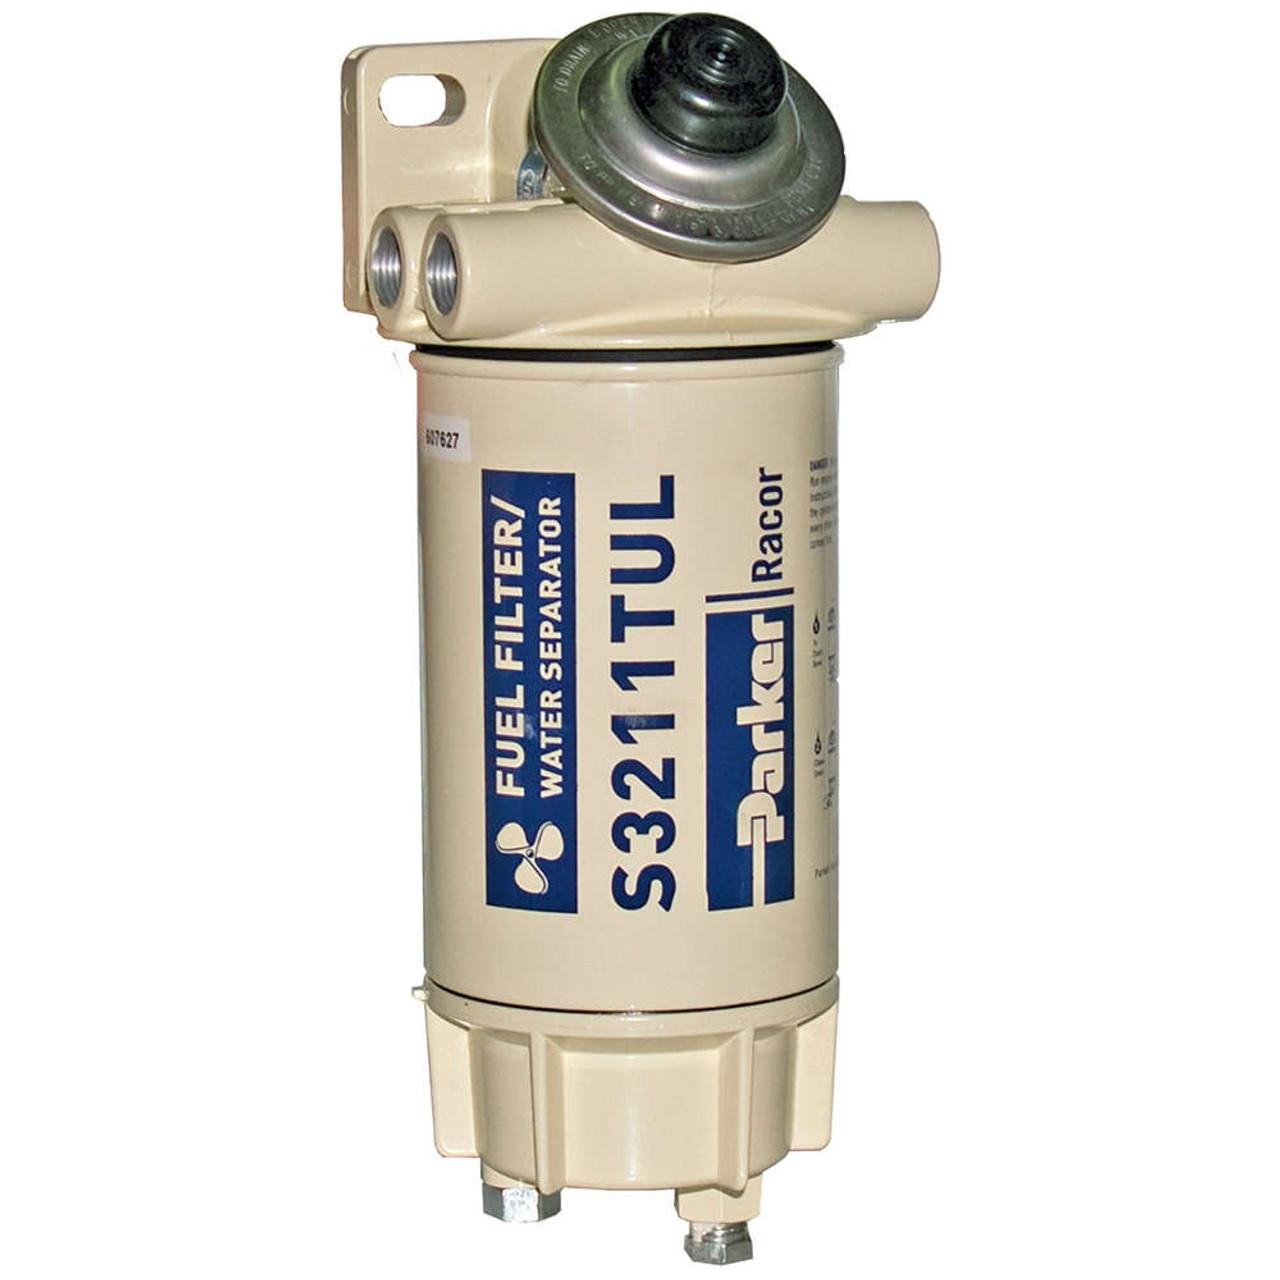 medium resolution of 60 gph spin on diesel fuel filter water separator assembly 6 qty john m ellsworth co inc